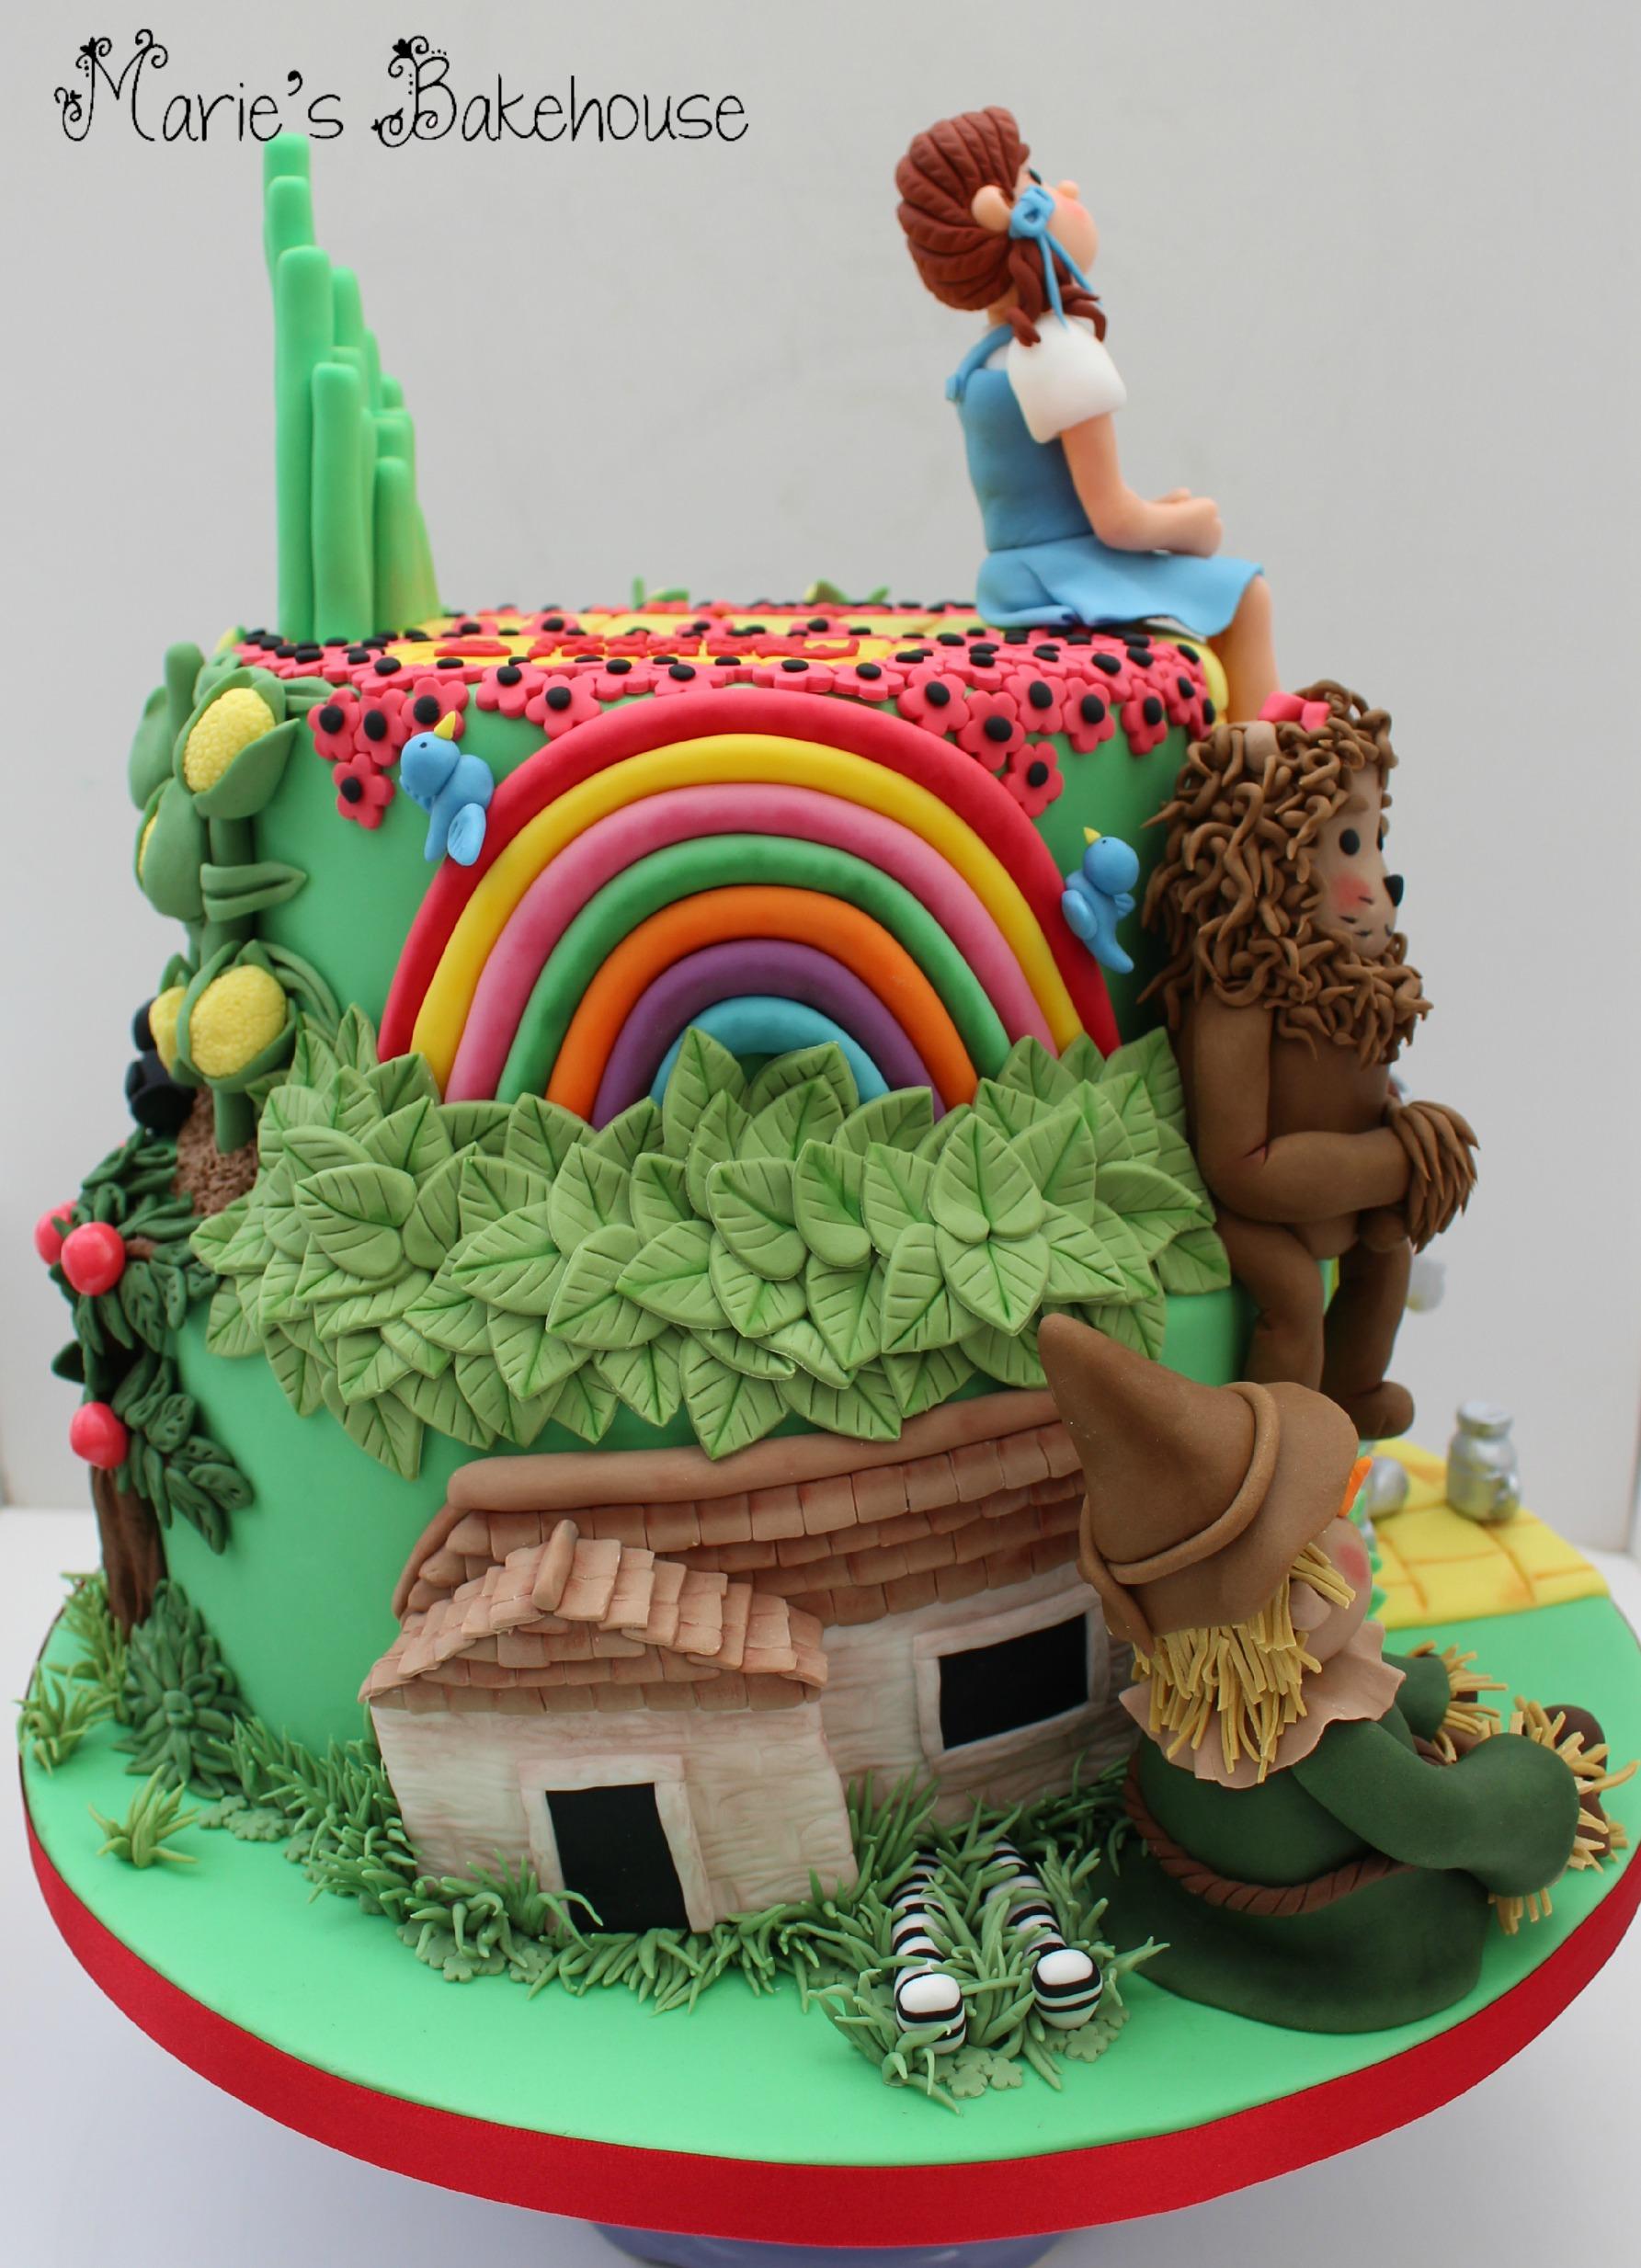 Enjoyable Gold Winning Wizard Of Oz Cake From Cake International Manchester Funny Birthday Cards Online Bapapcheapnameinfo